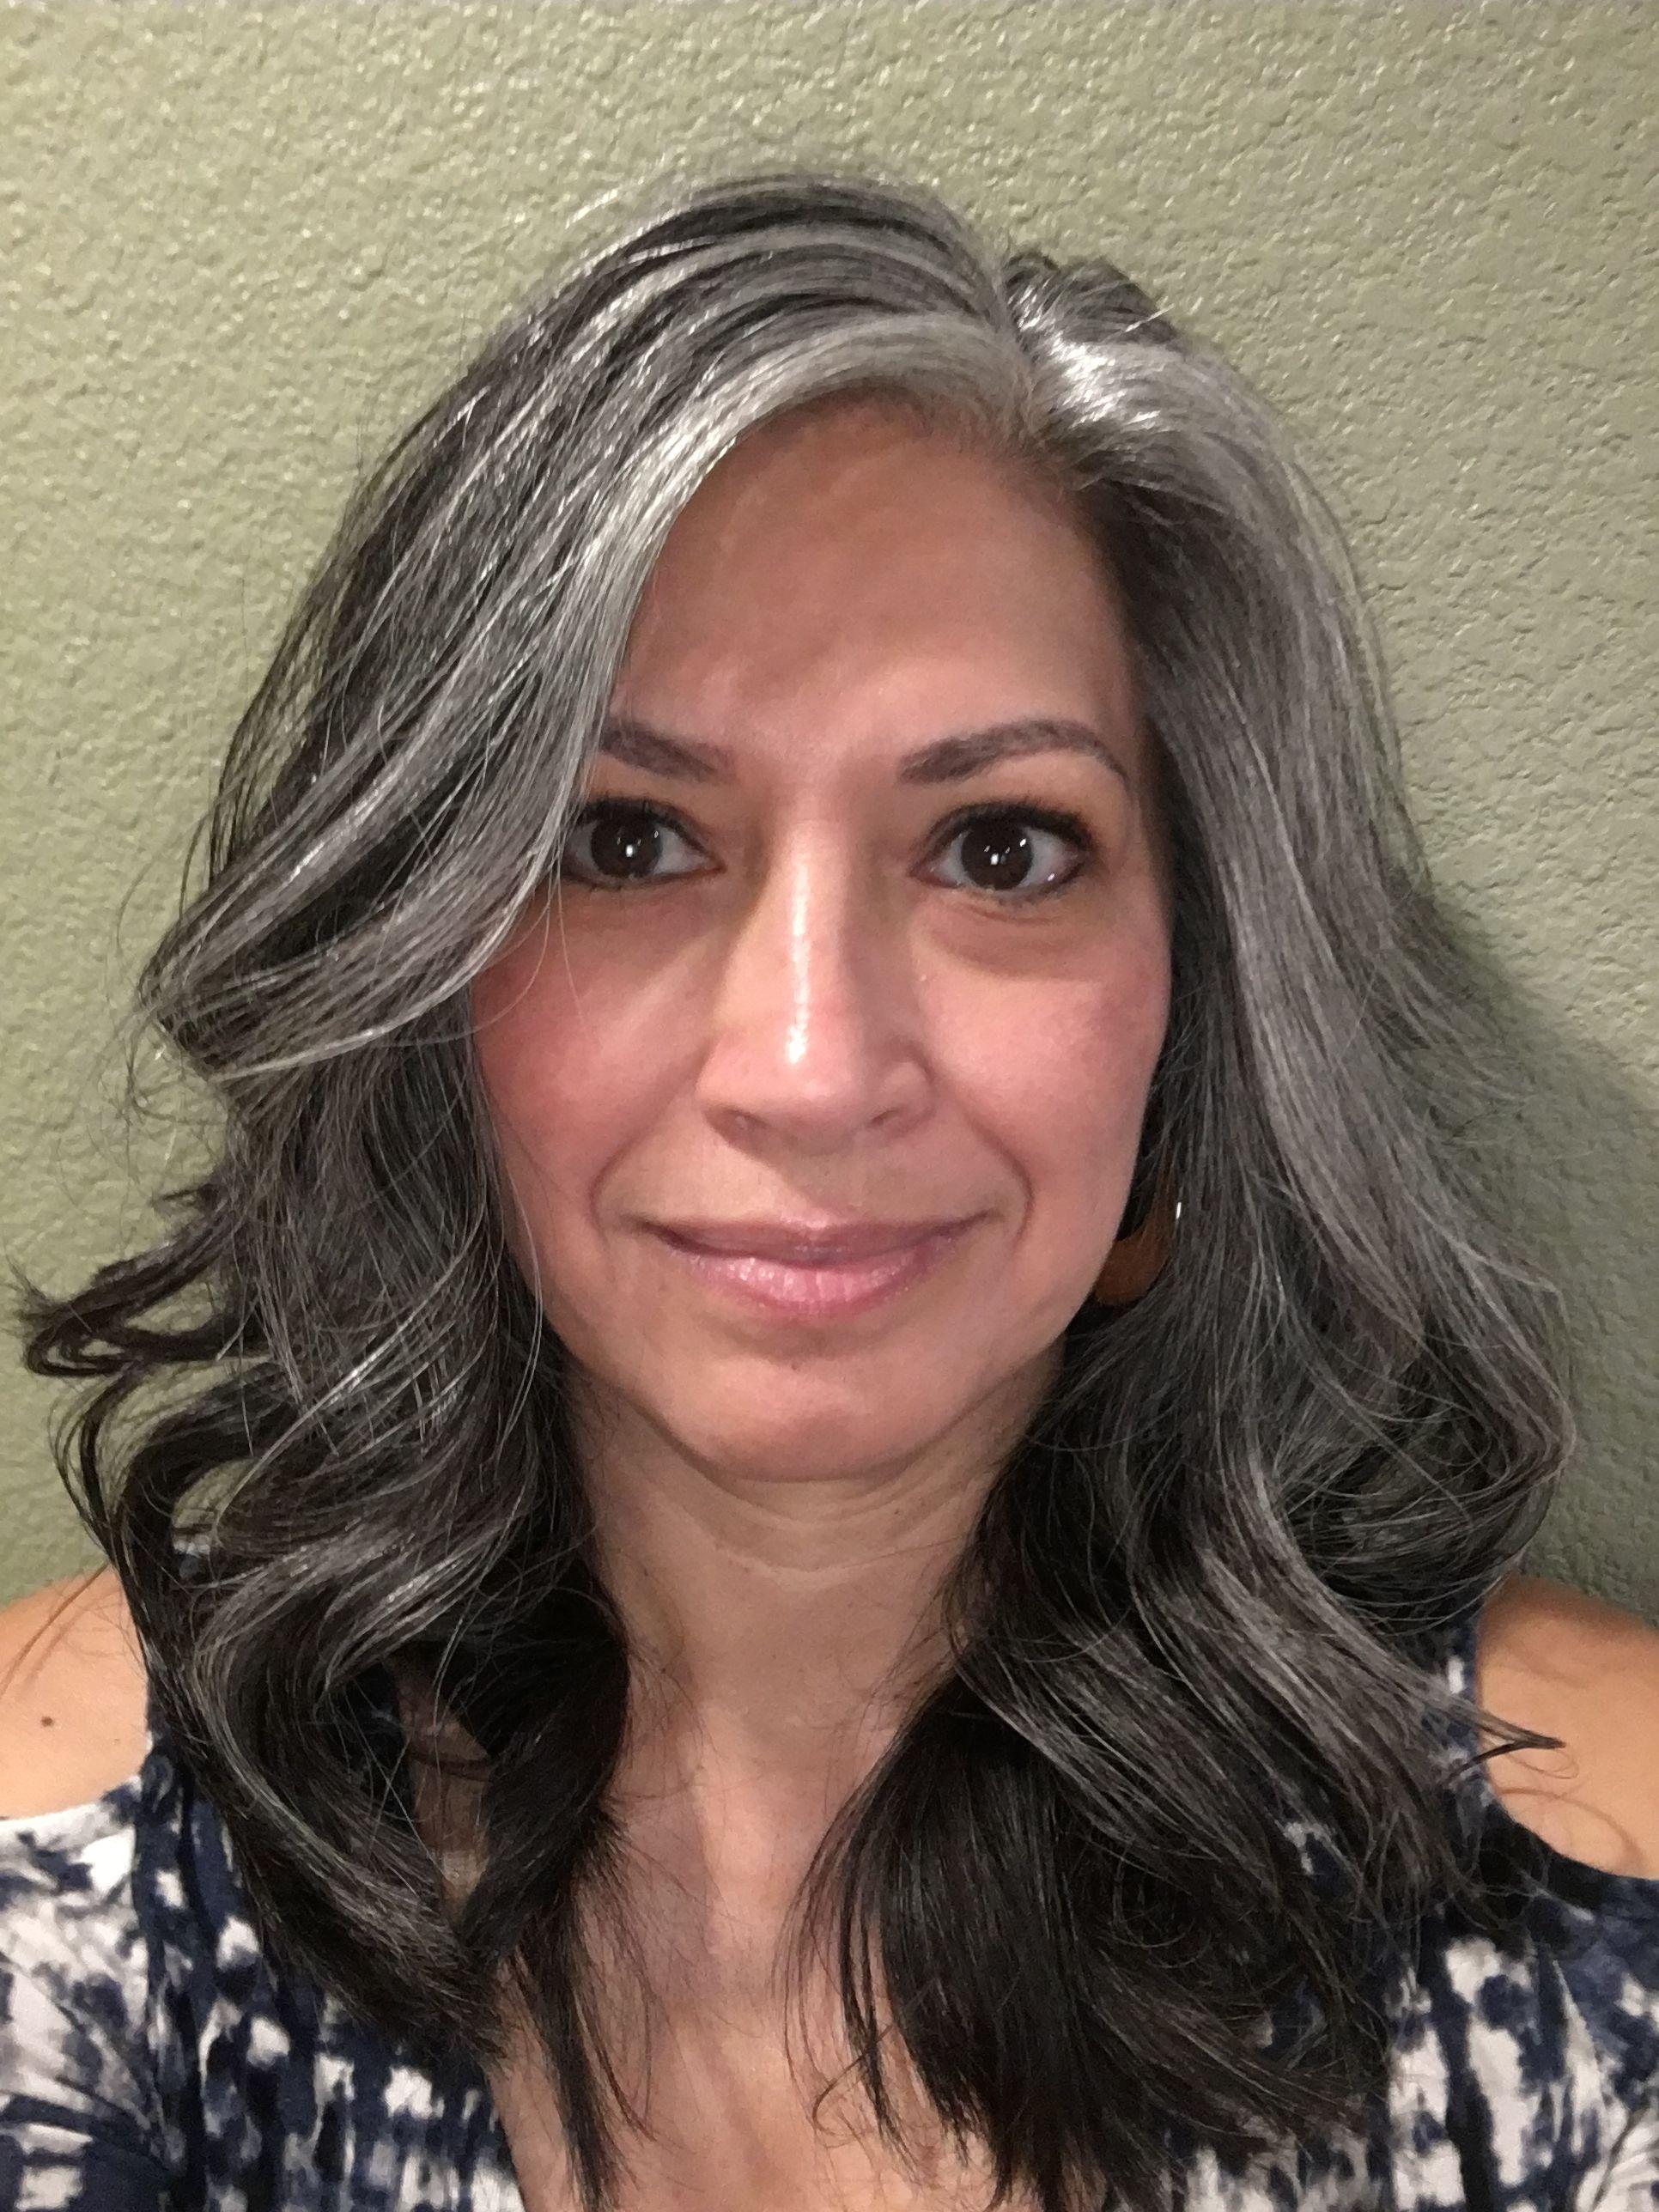 Beauty . . . | Gray hair growing out, Long gray hair, Grey ...